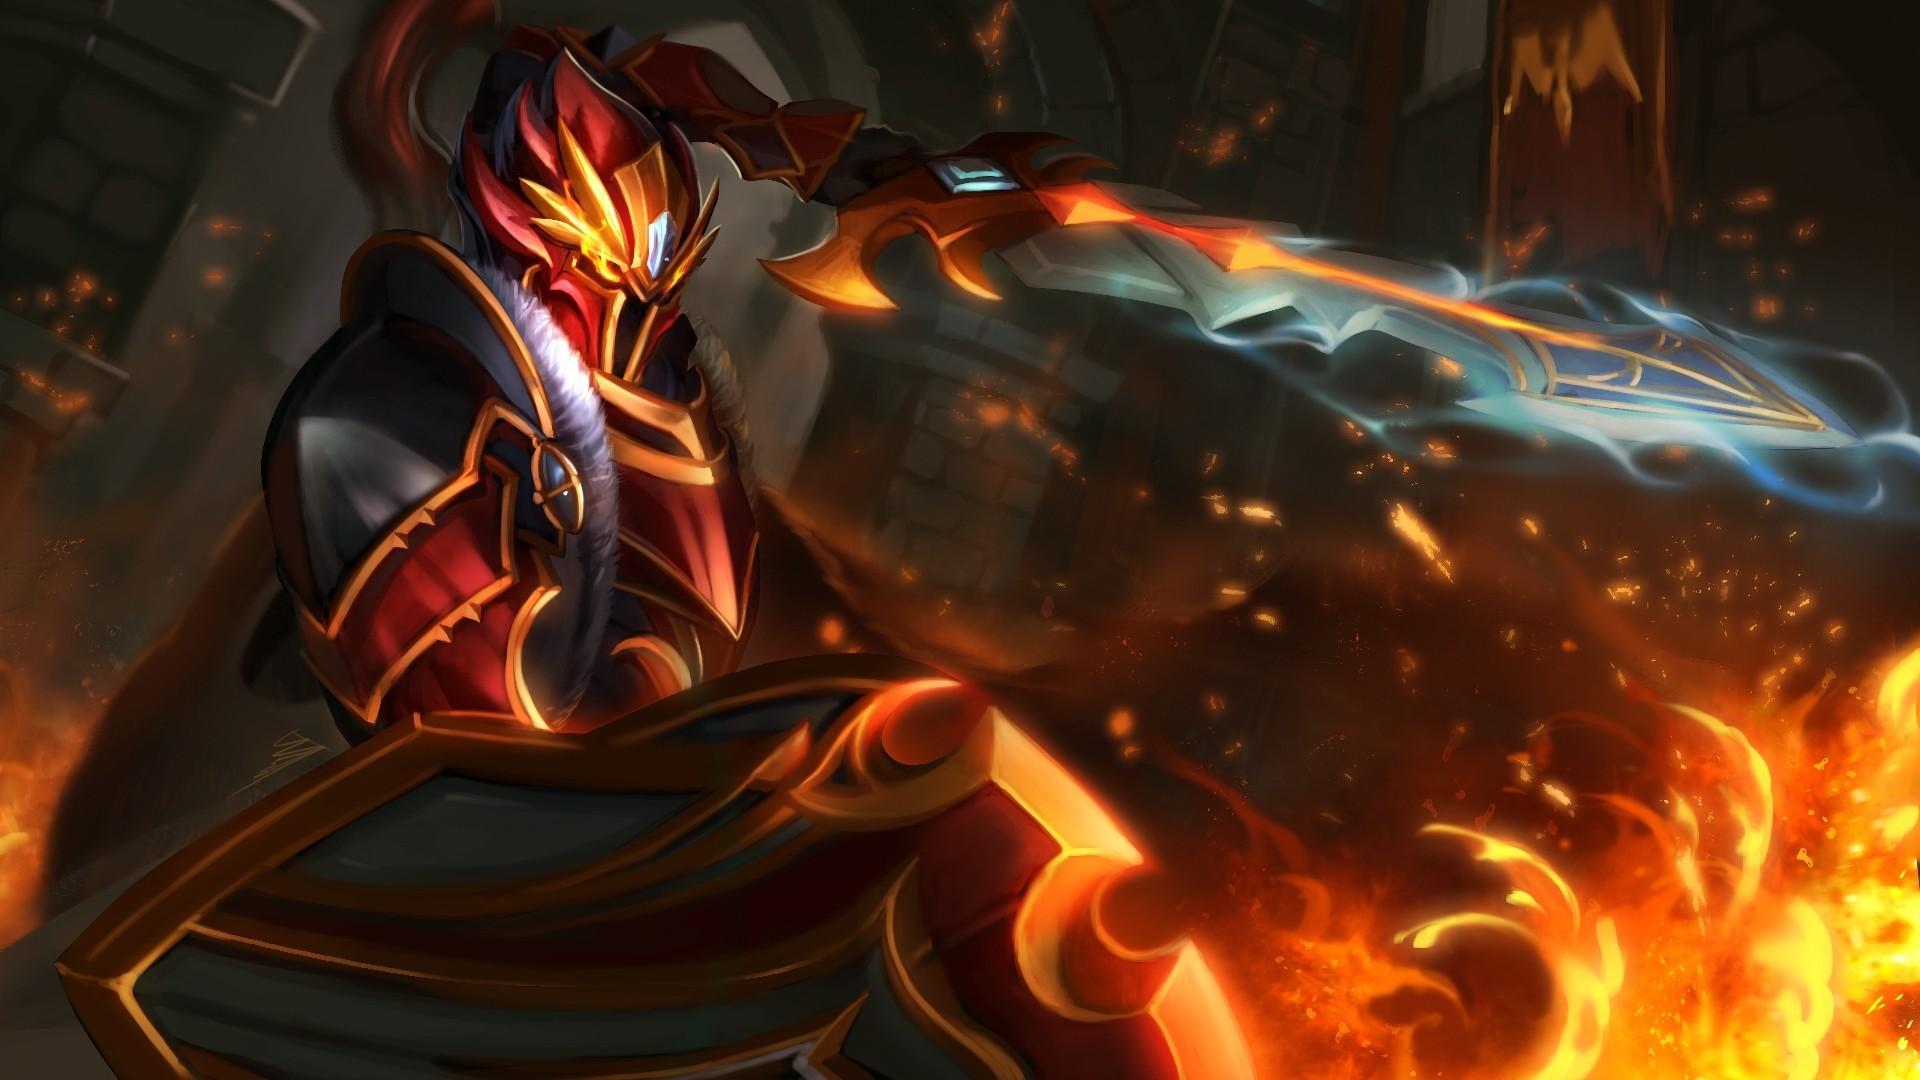 Dota 2 Dota Defense Of The Ancients Valve Valve Dota 2 Dragon Knight Wallpaper Hd 1562219 Hd Wallpaper Backgrounds Download